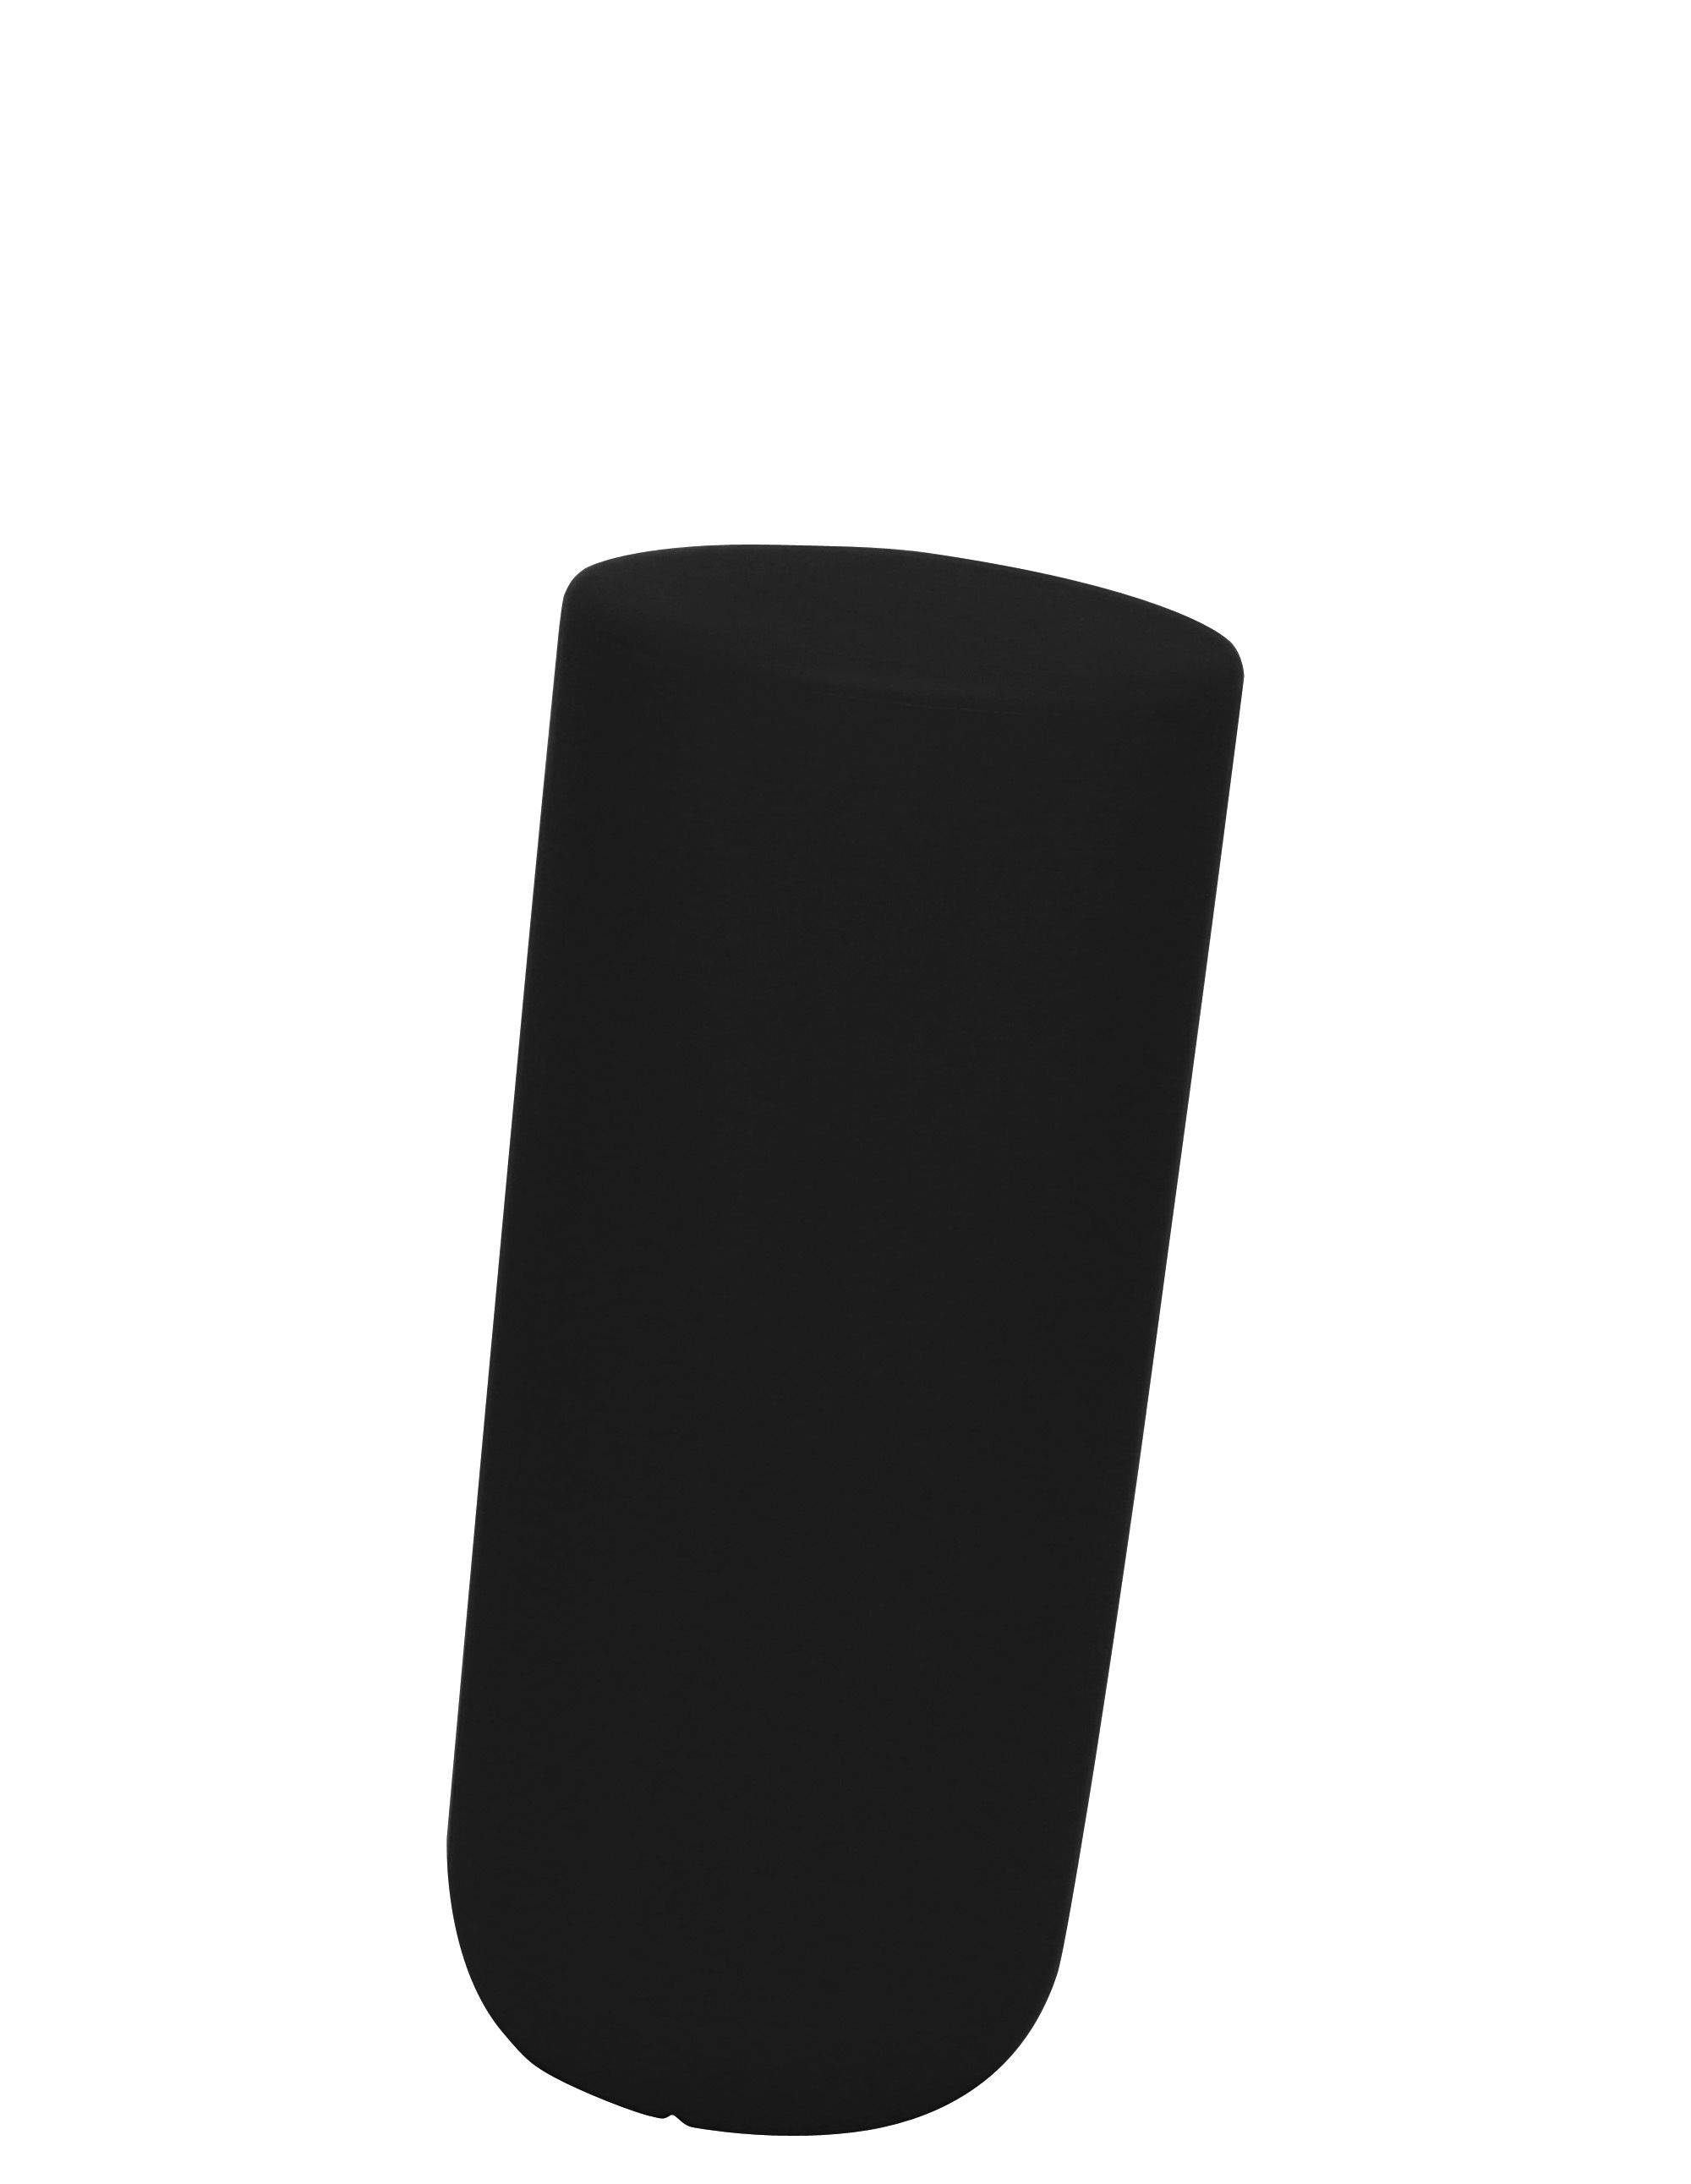 Mobilier - Mobilier Ados - Tabouret Sway H 50 cm - Thelermont Hupton - Noir - Polyéthylène